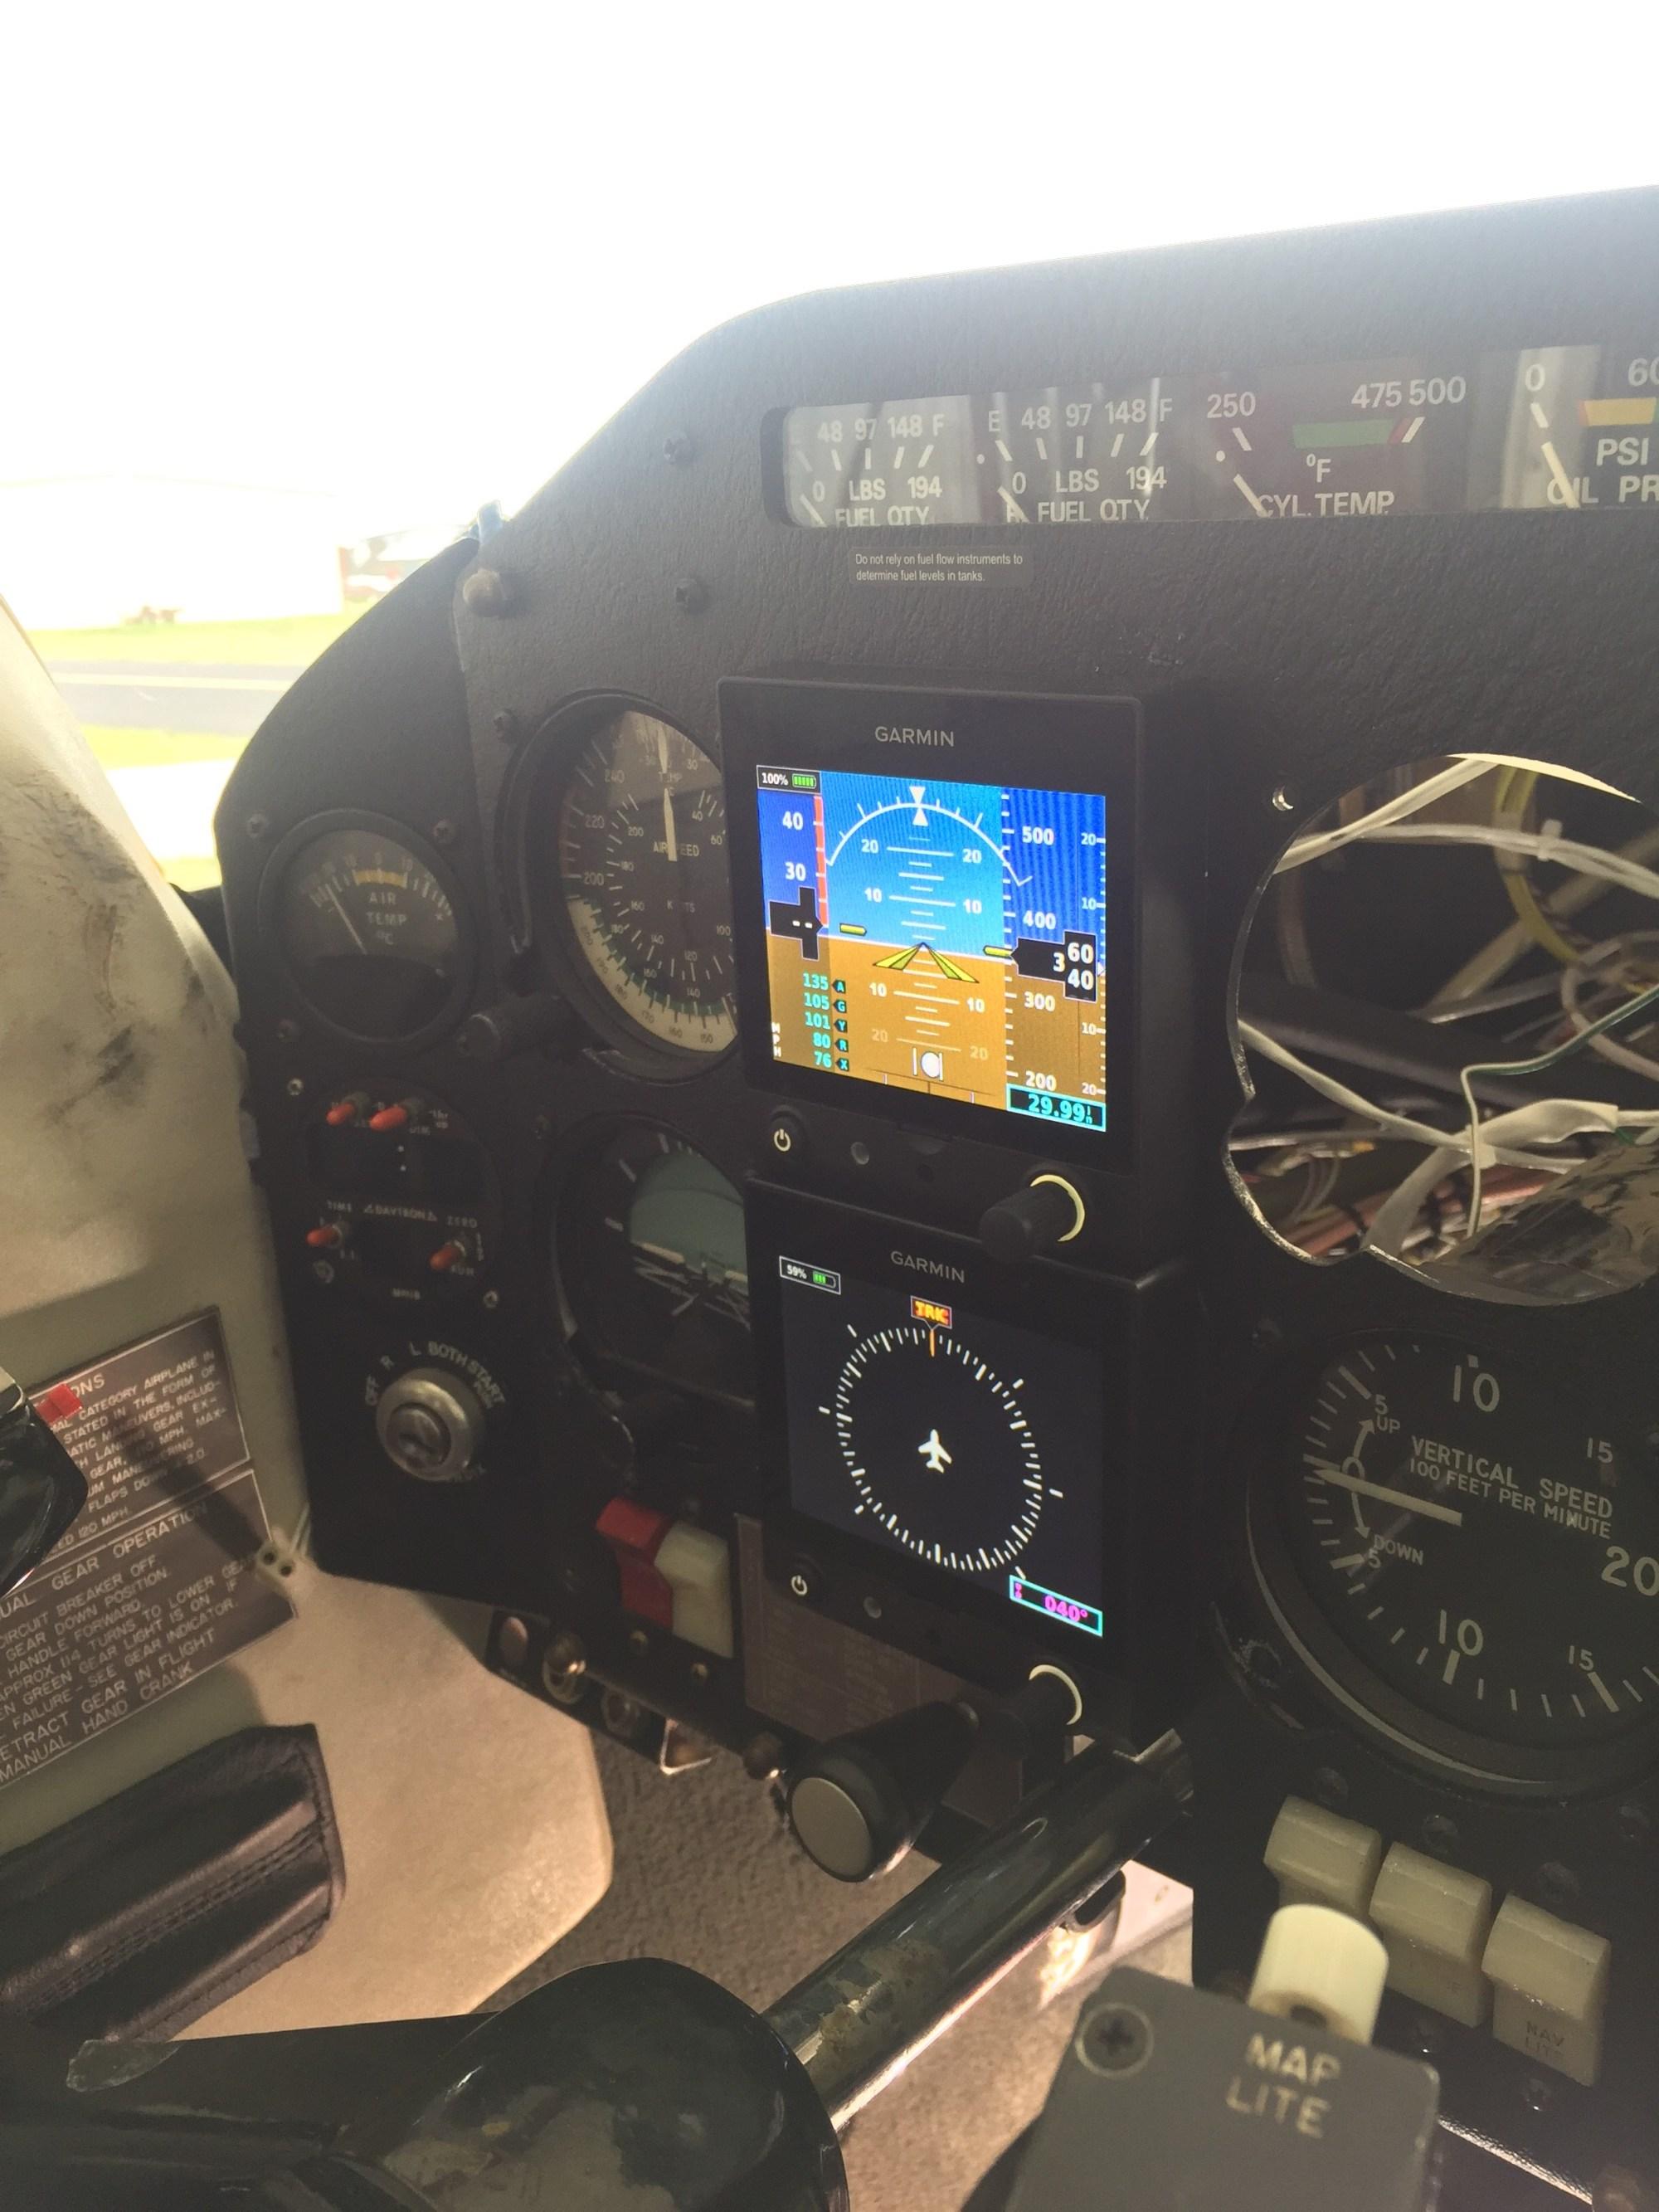 hight resolution of  aircraft wire harness redo on aircraft harness assembly aircraft tires aircraft bushing